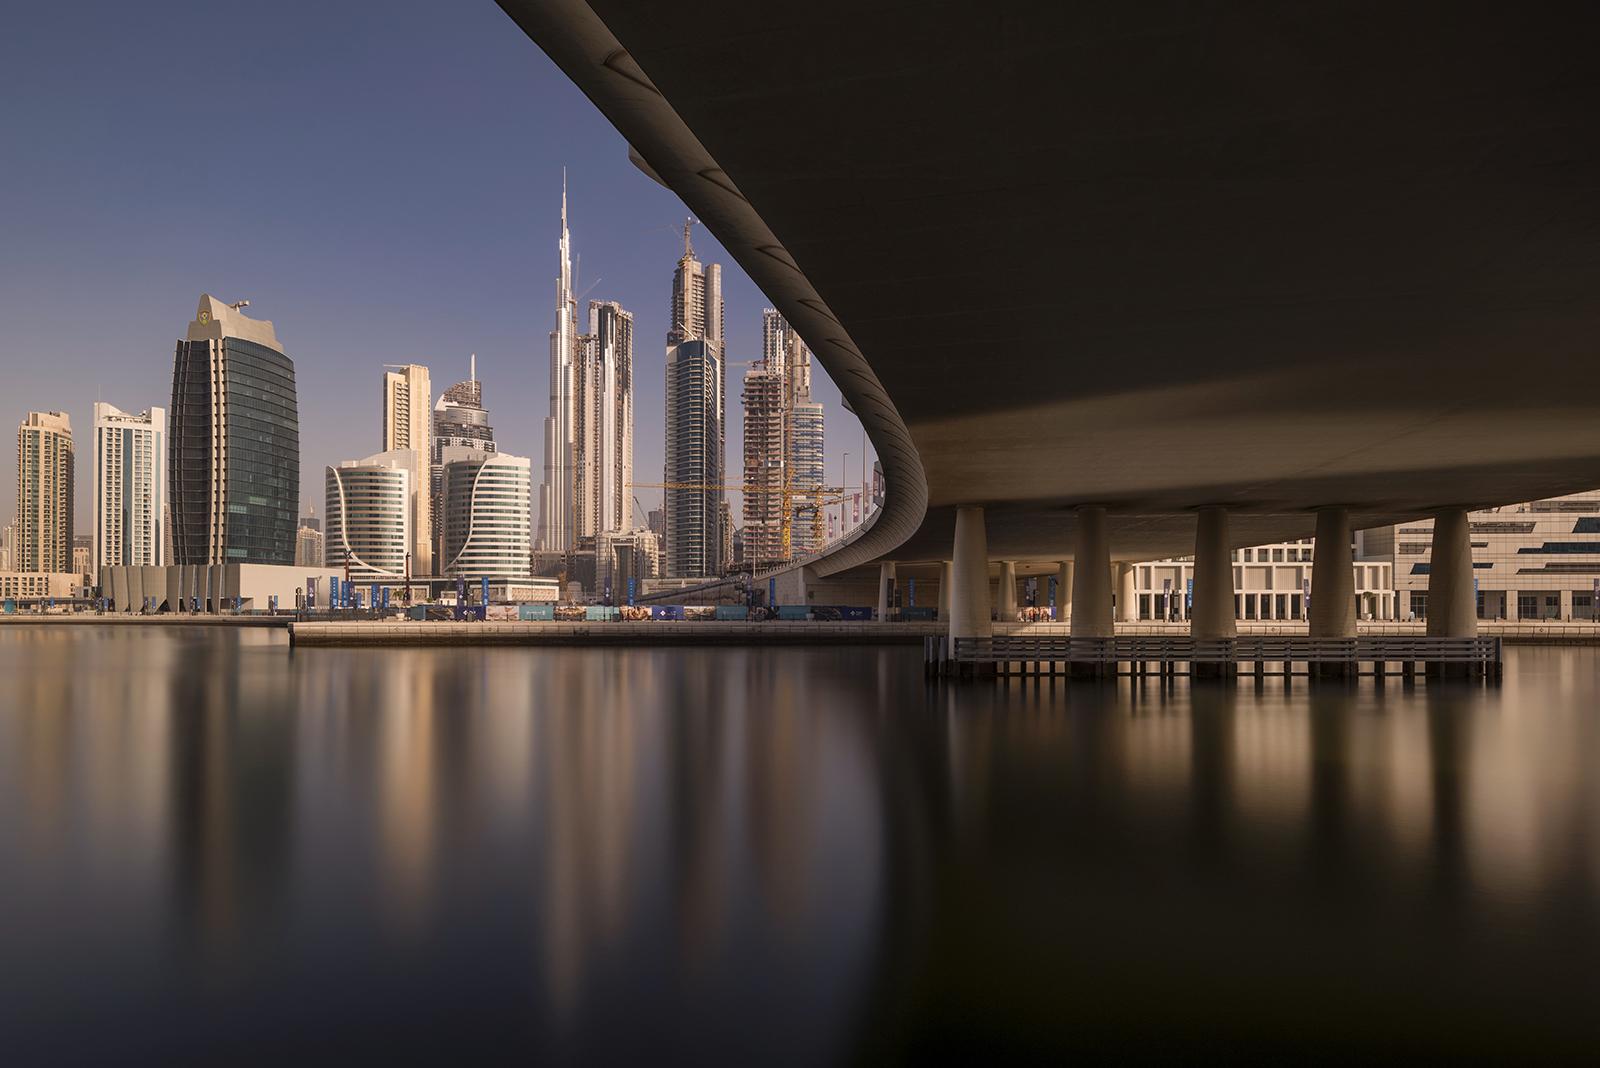 Burj Khalifa from business bay